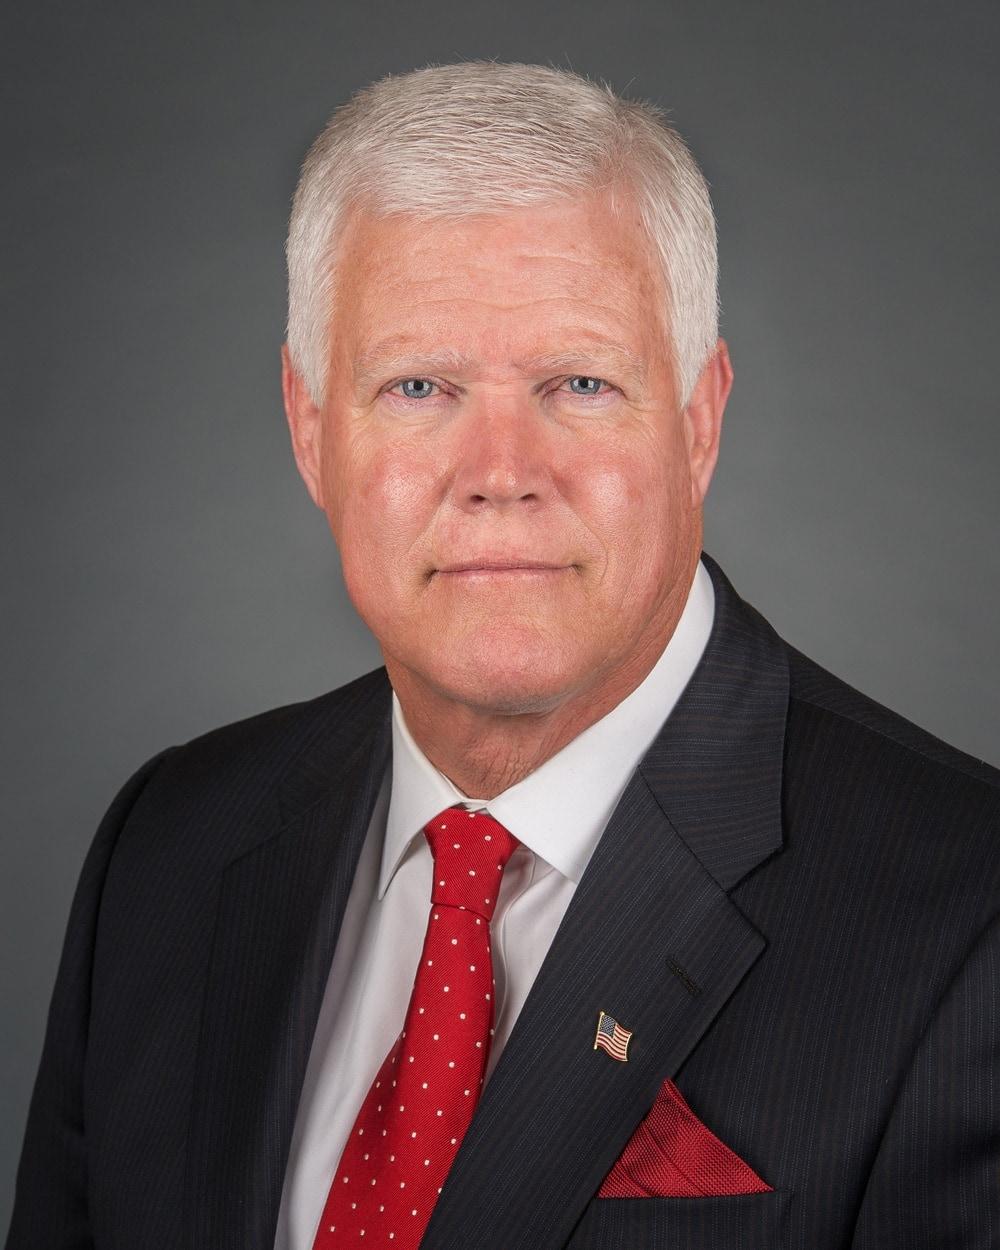 Michael Callahan, Interim Chairman and CEO, Vista Outdoor. (Photo: Vista)